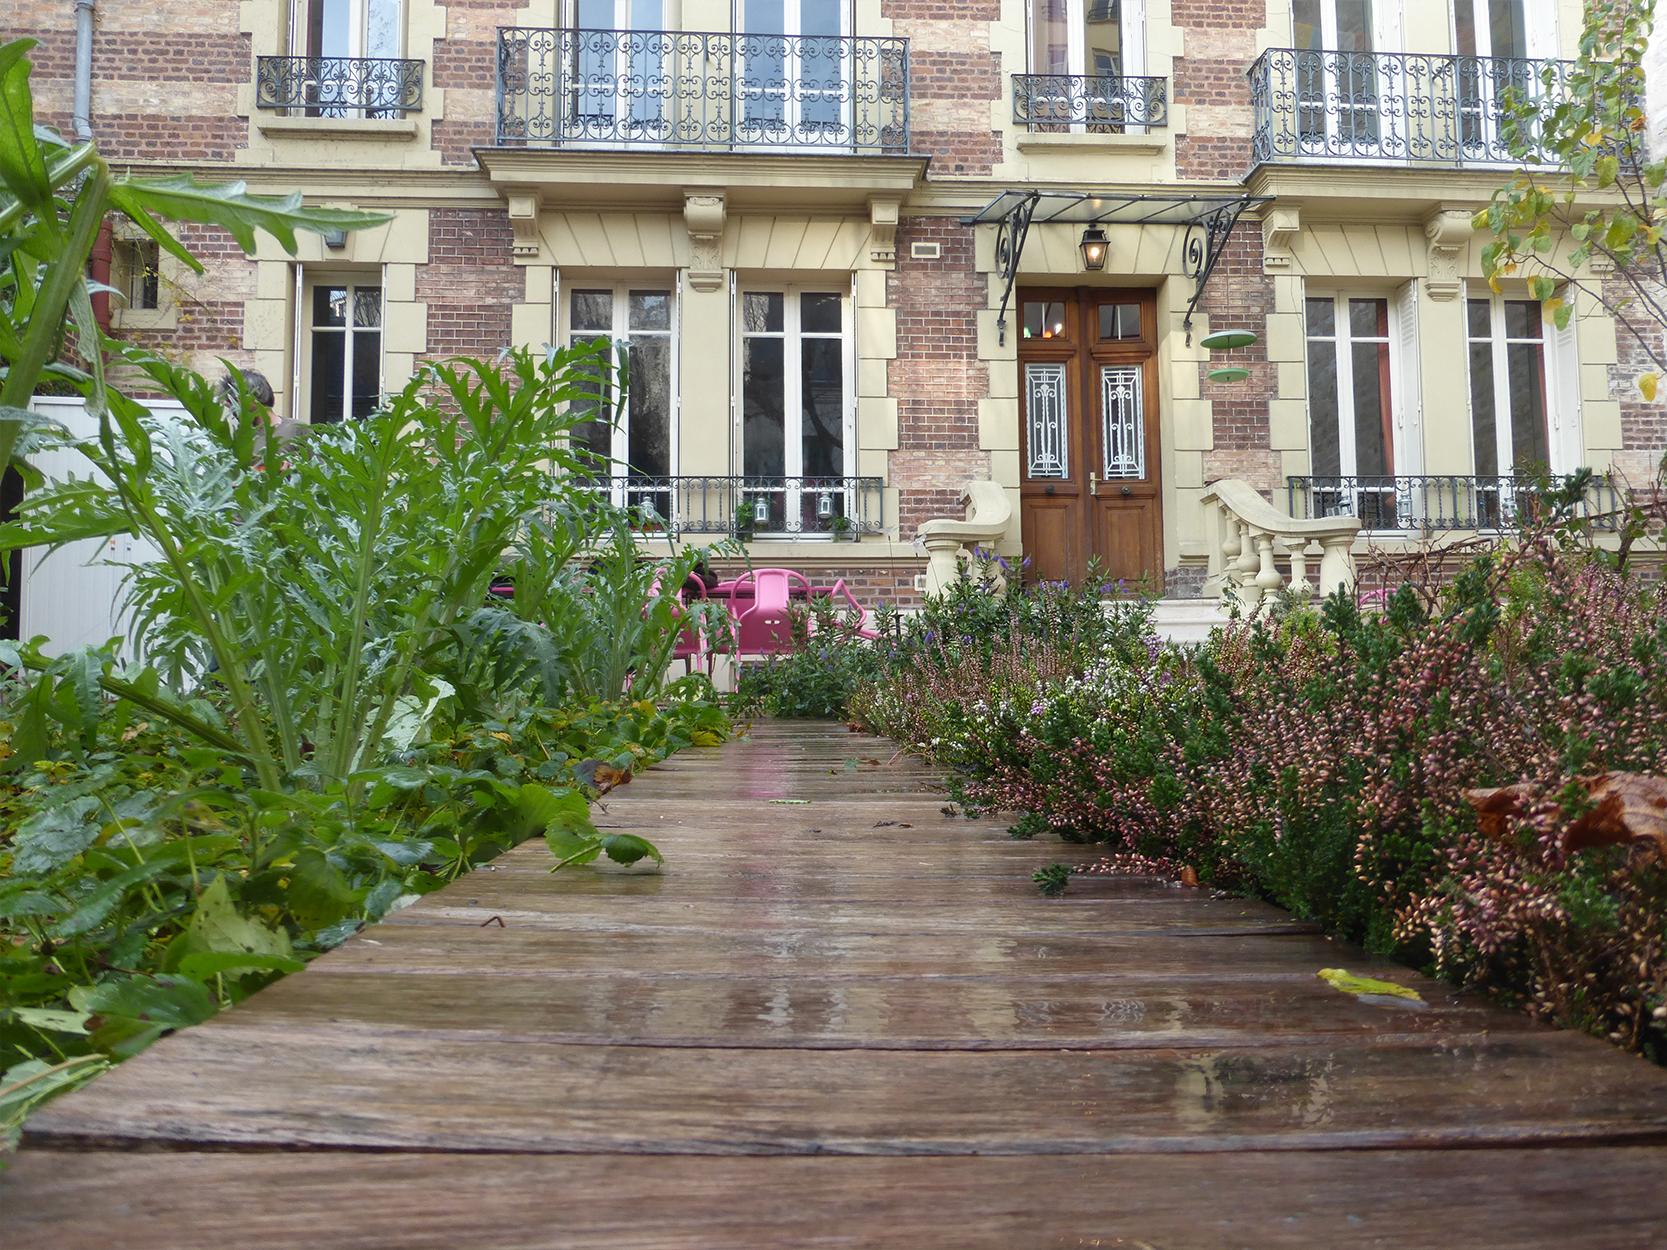 les-jardiniers-a-velo-entretien-amenagement-jardin-terrasse-paysagiste-terrasse2bd